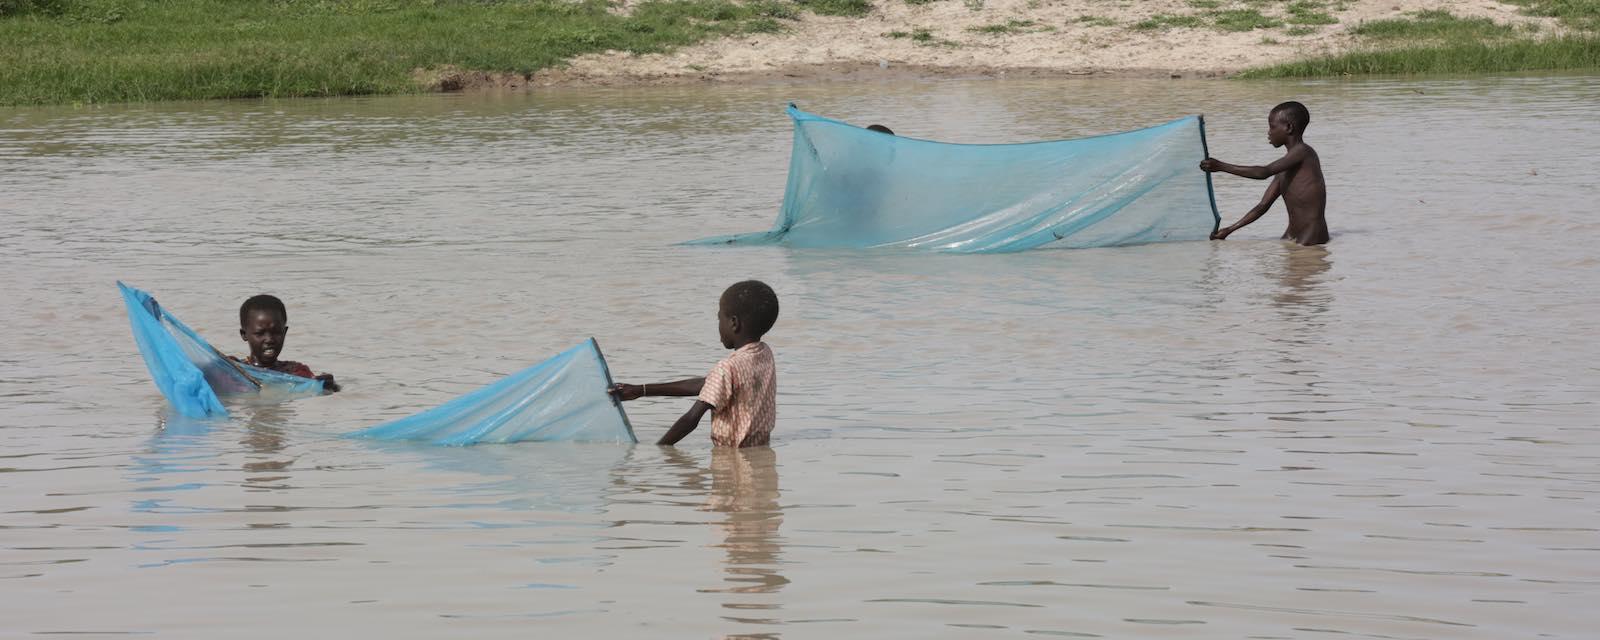 Children fish in the river in Pibor, South Sudan (Photo: Nektarios Markogiannis/UN Photo)